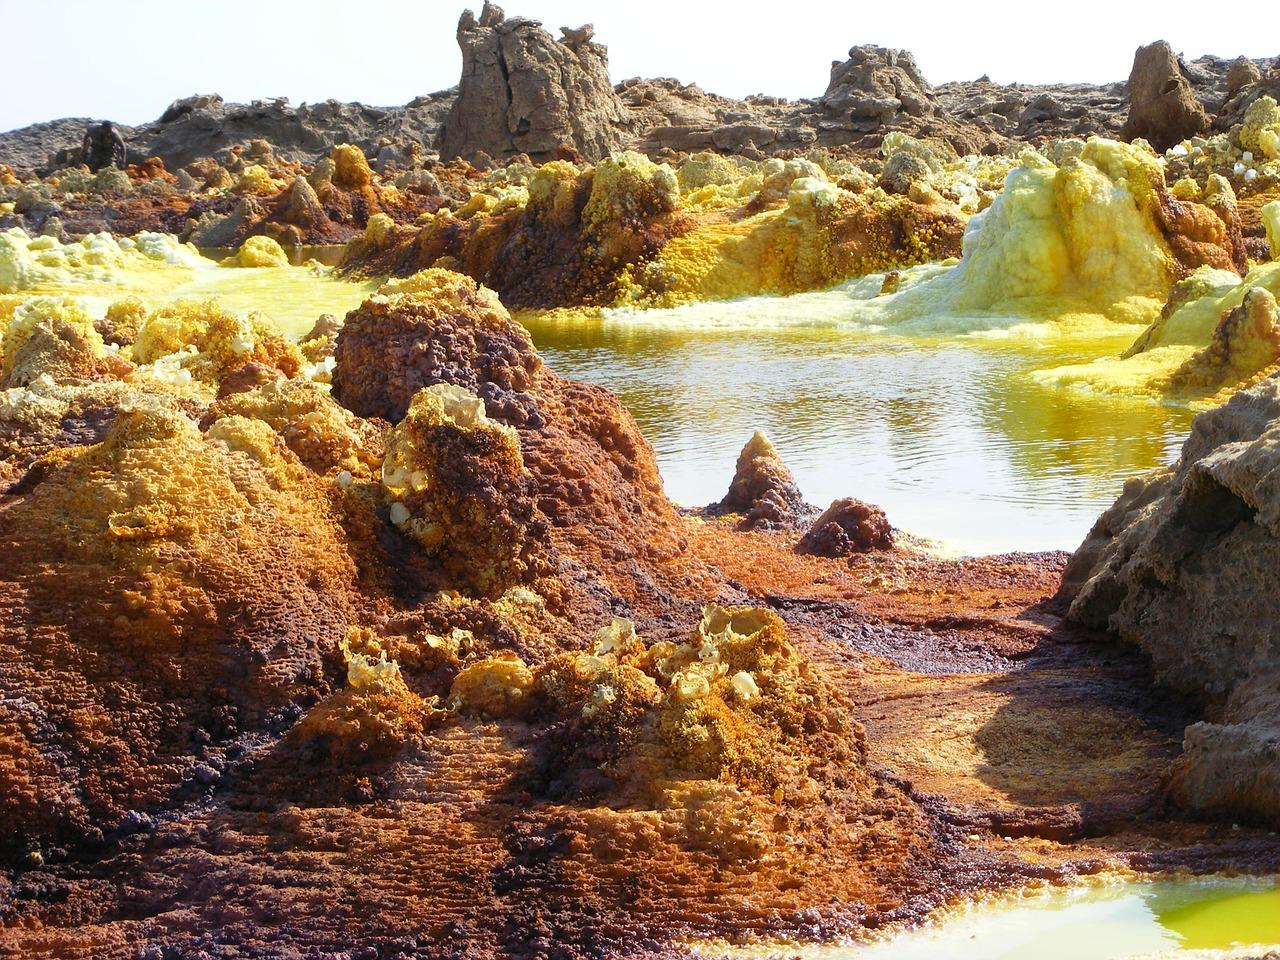 Le champ hydrothermal de Dallol